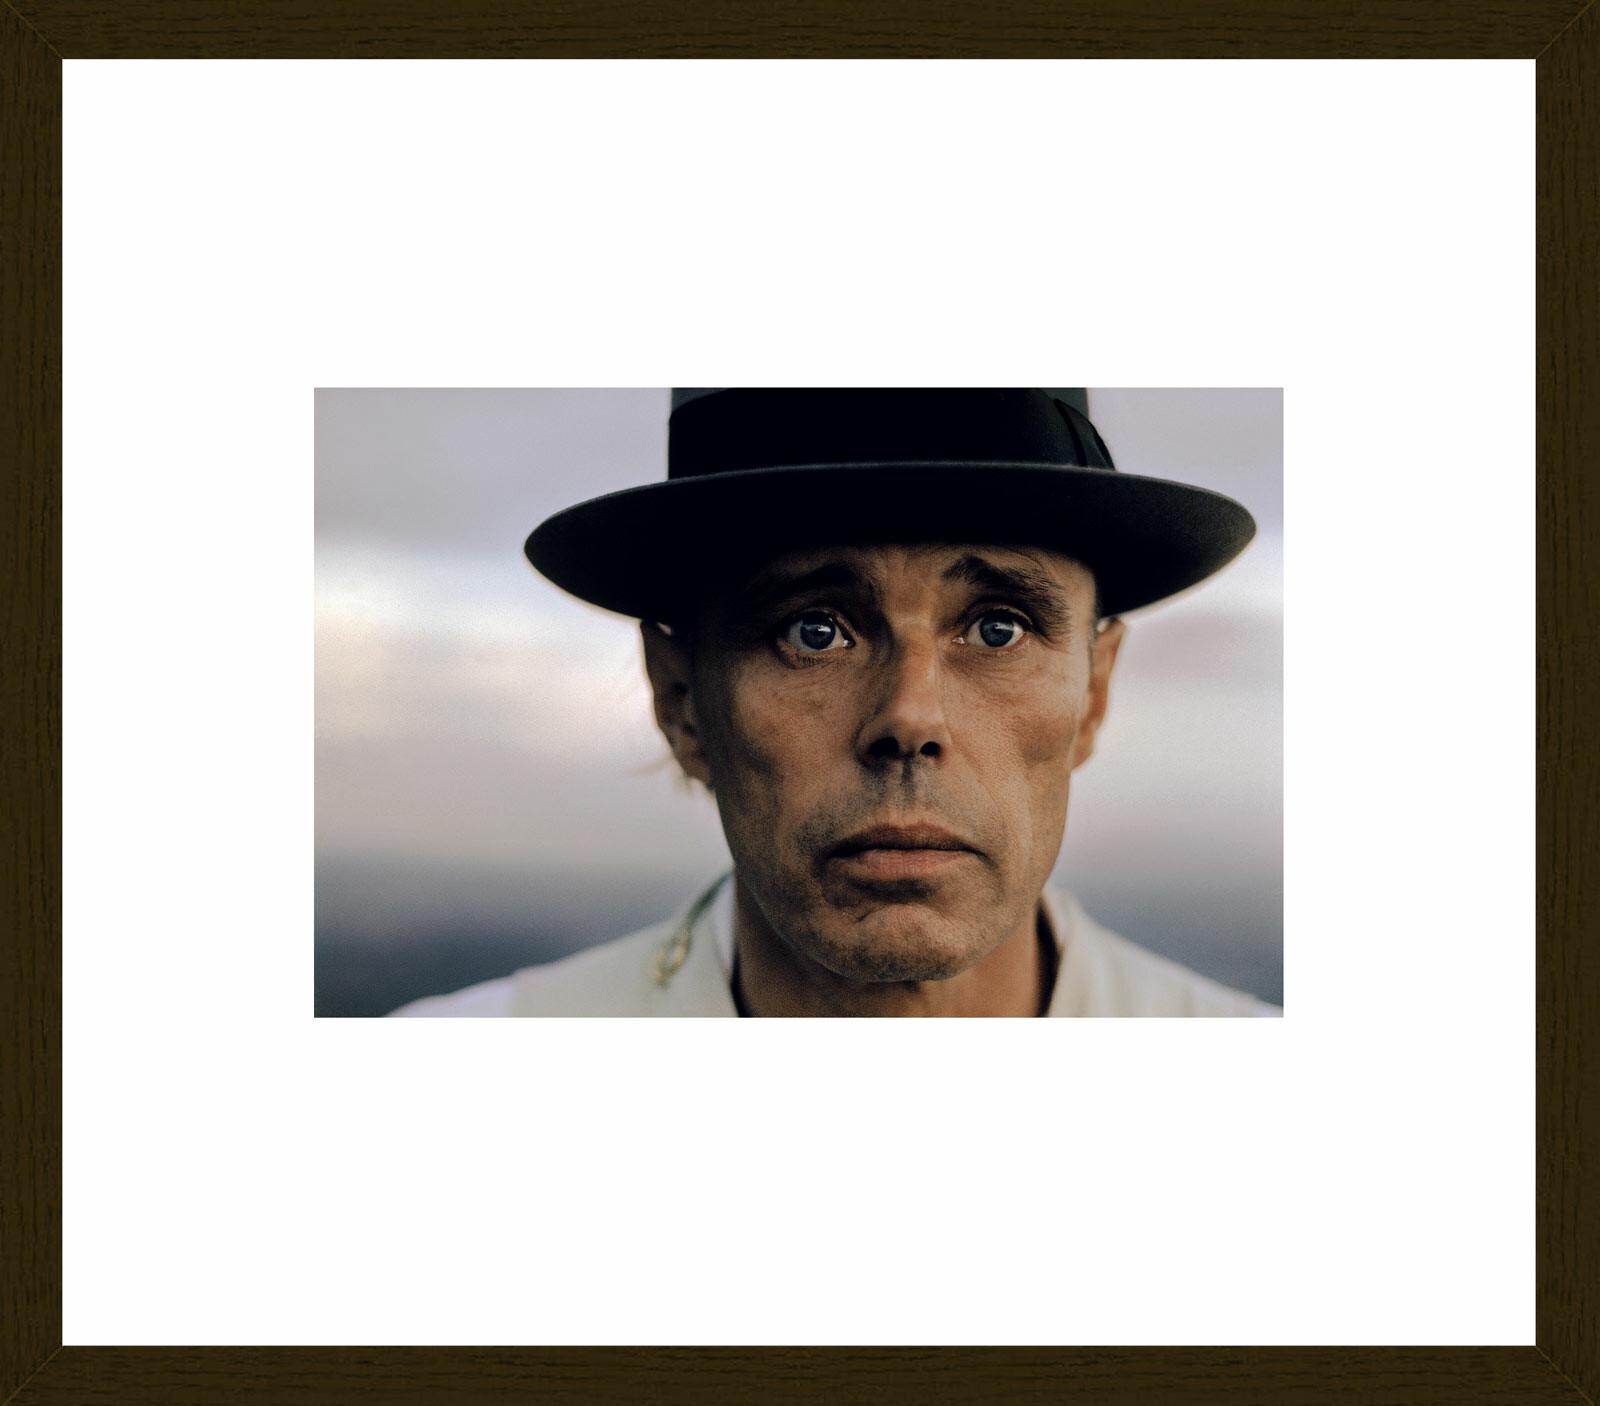 Joseph Beuys, Schottland 1974 - Robert Lebeck